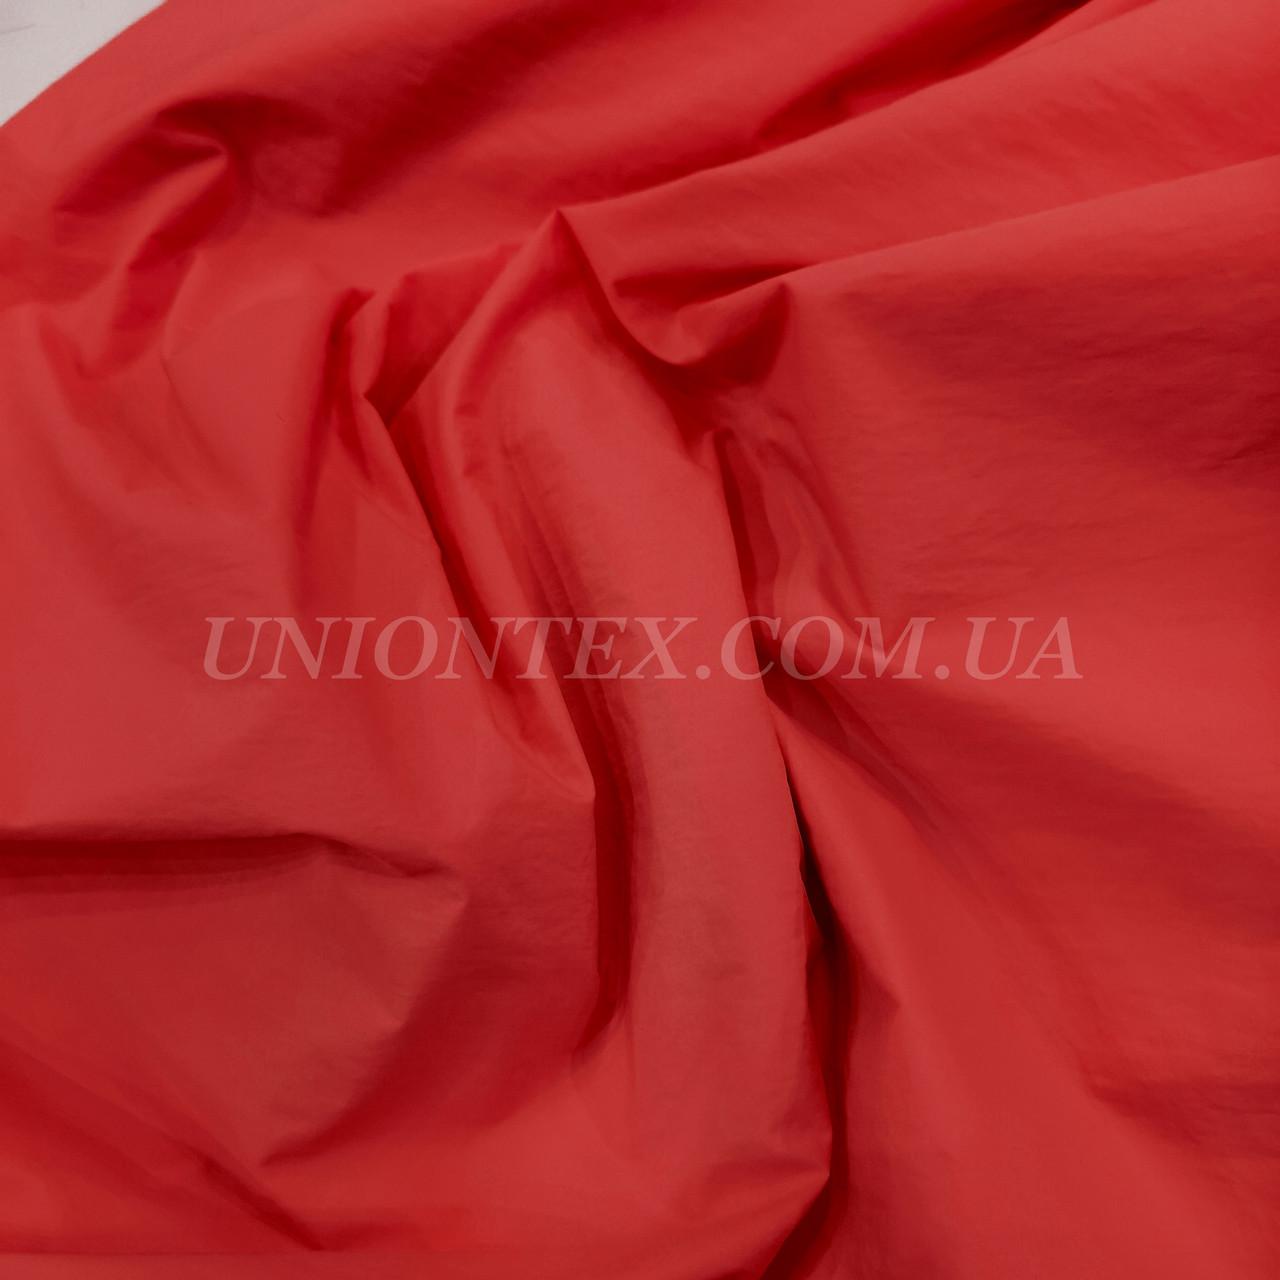 Ткань парашют красный